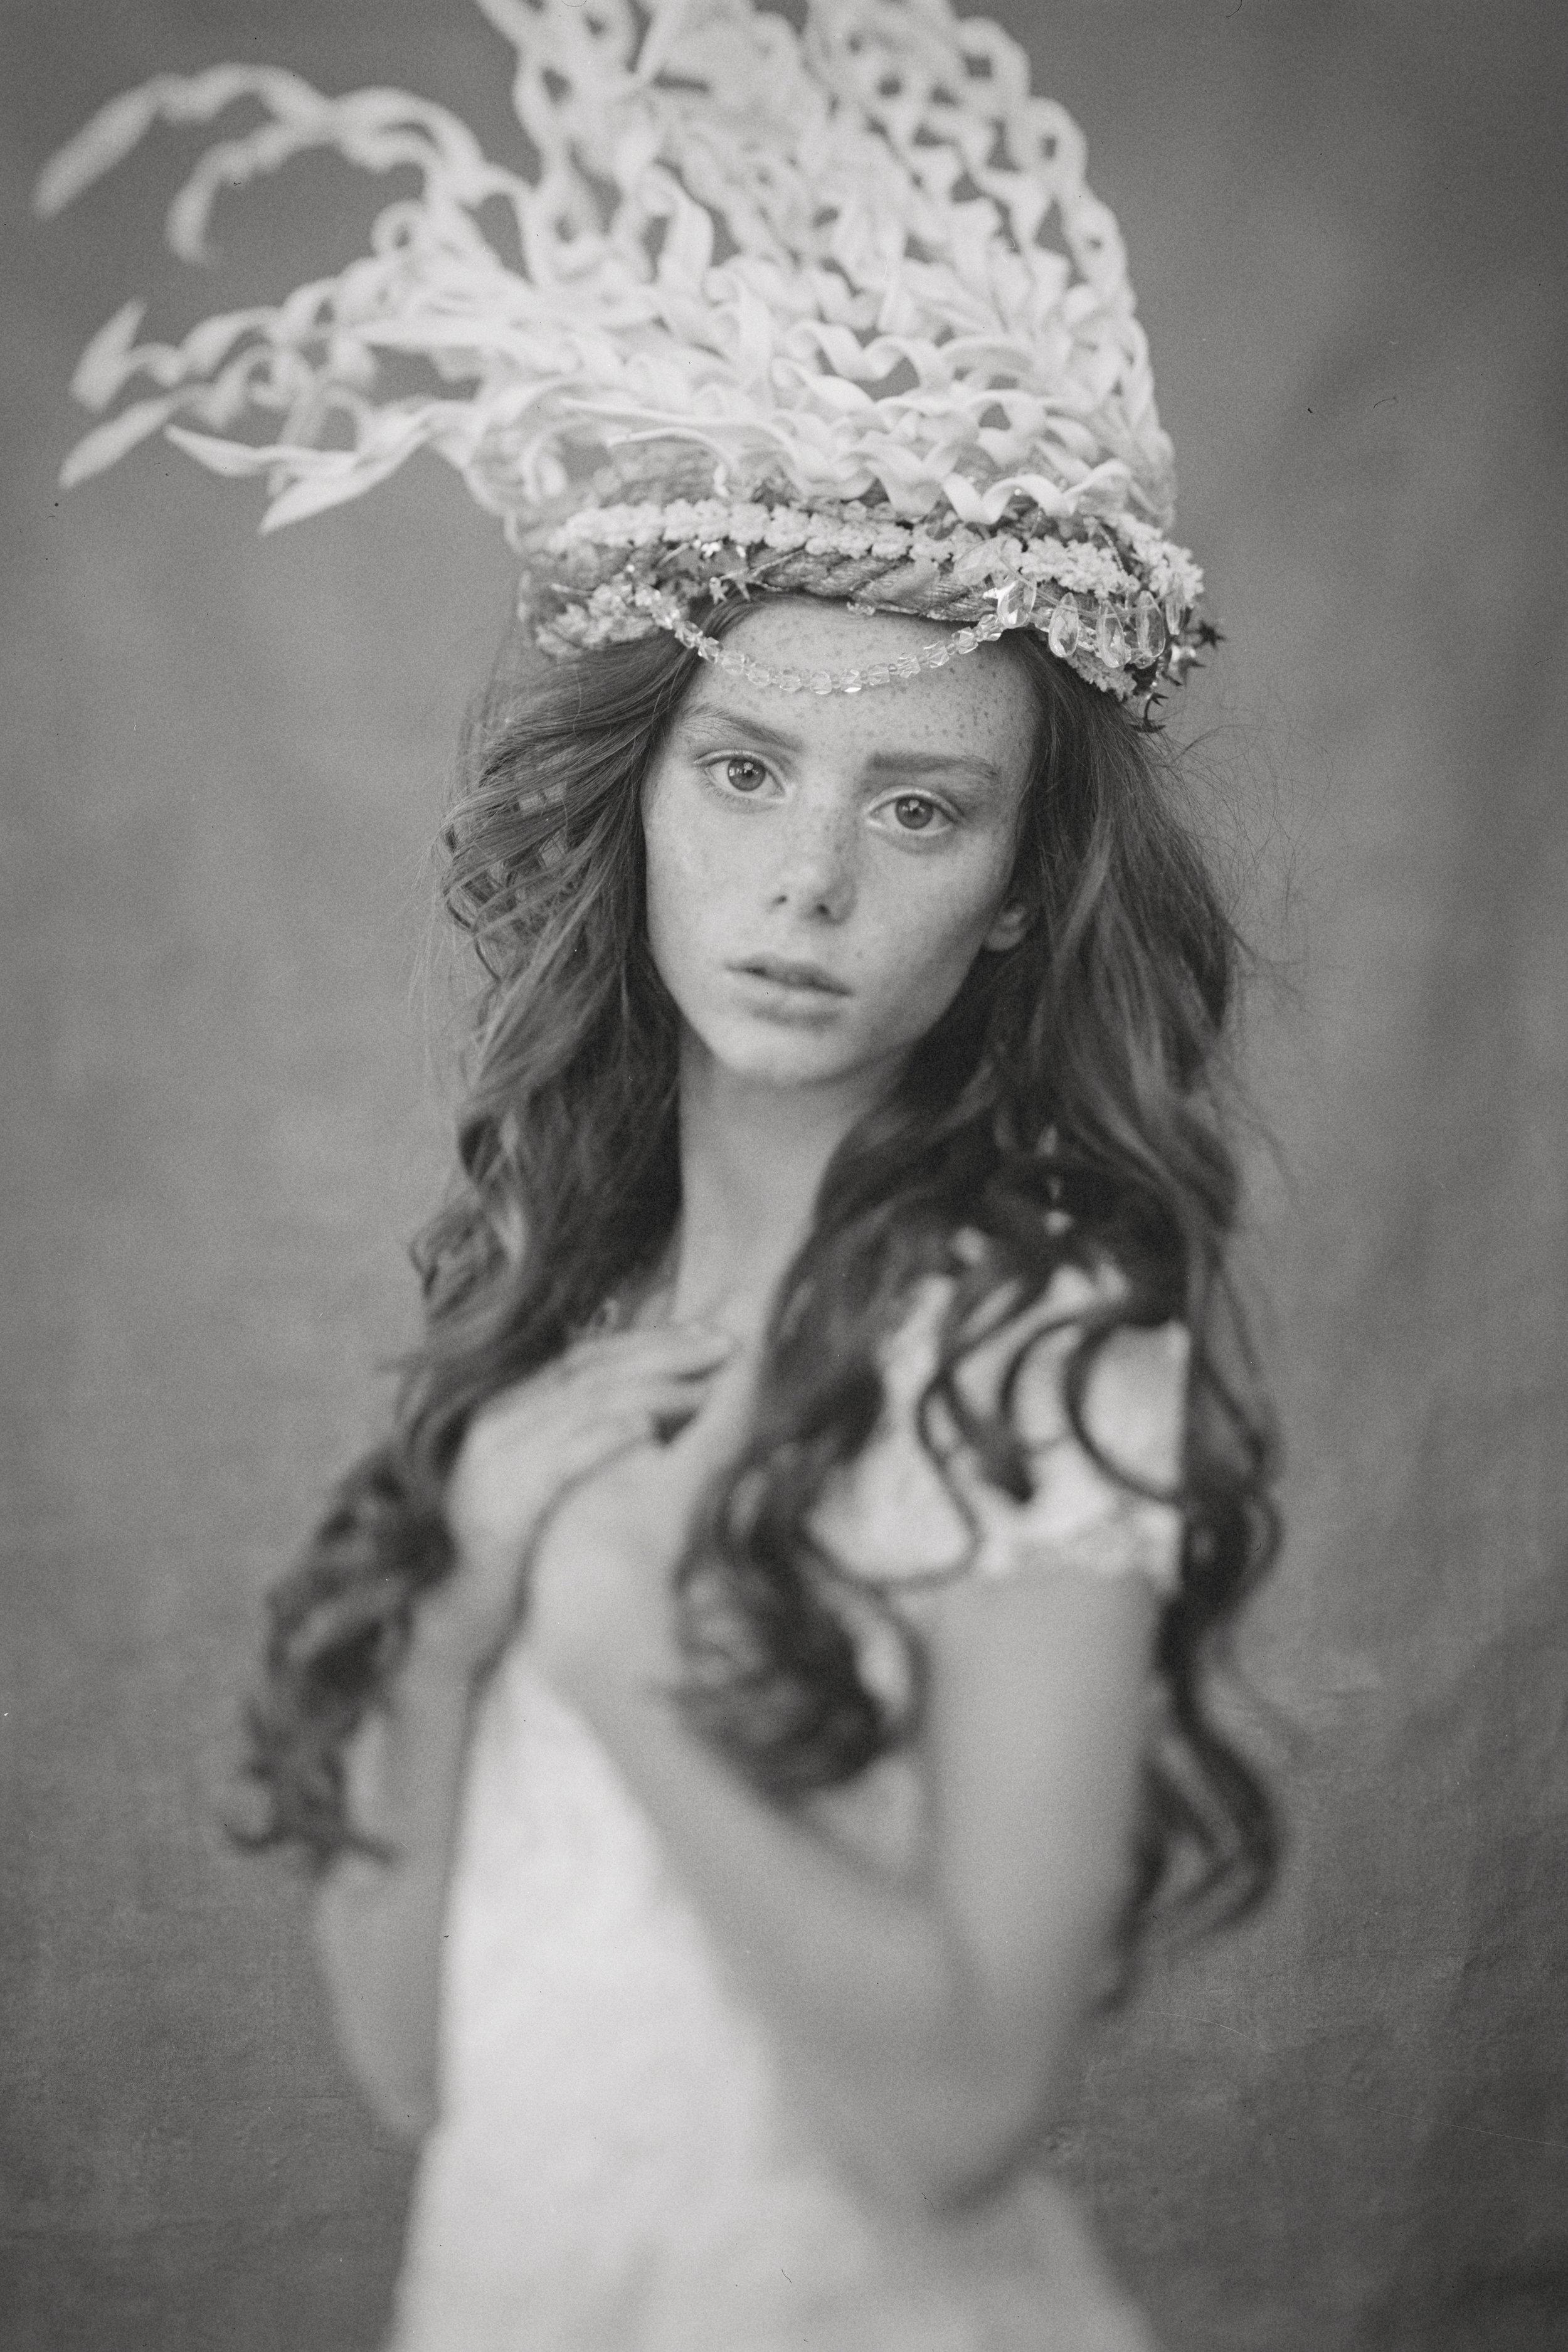 Marta-hewson-Emeryss-Teen-Portrait-Fashion-shoot-film photography.jpg